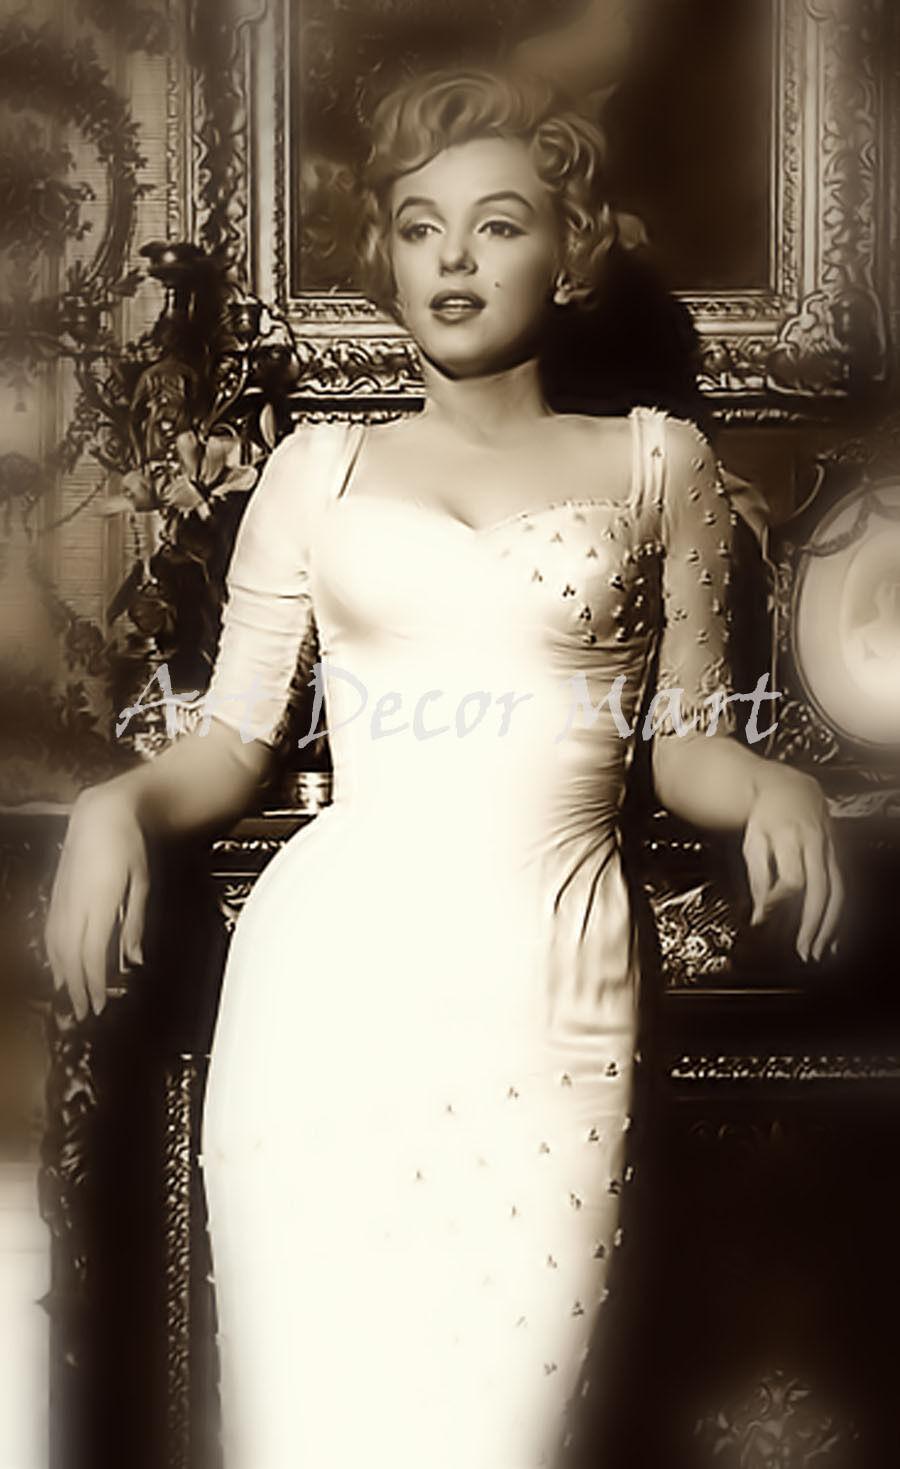 Marilyn Monroe-2 - CANVAS OR PRINT WALL ART